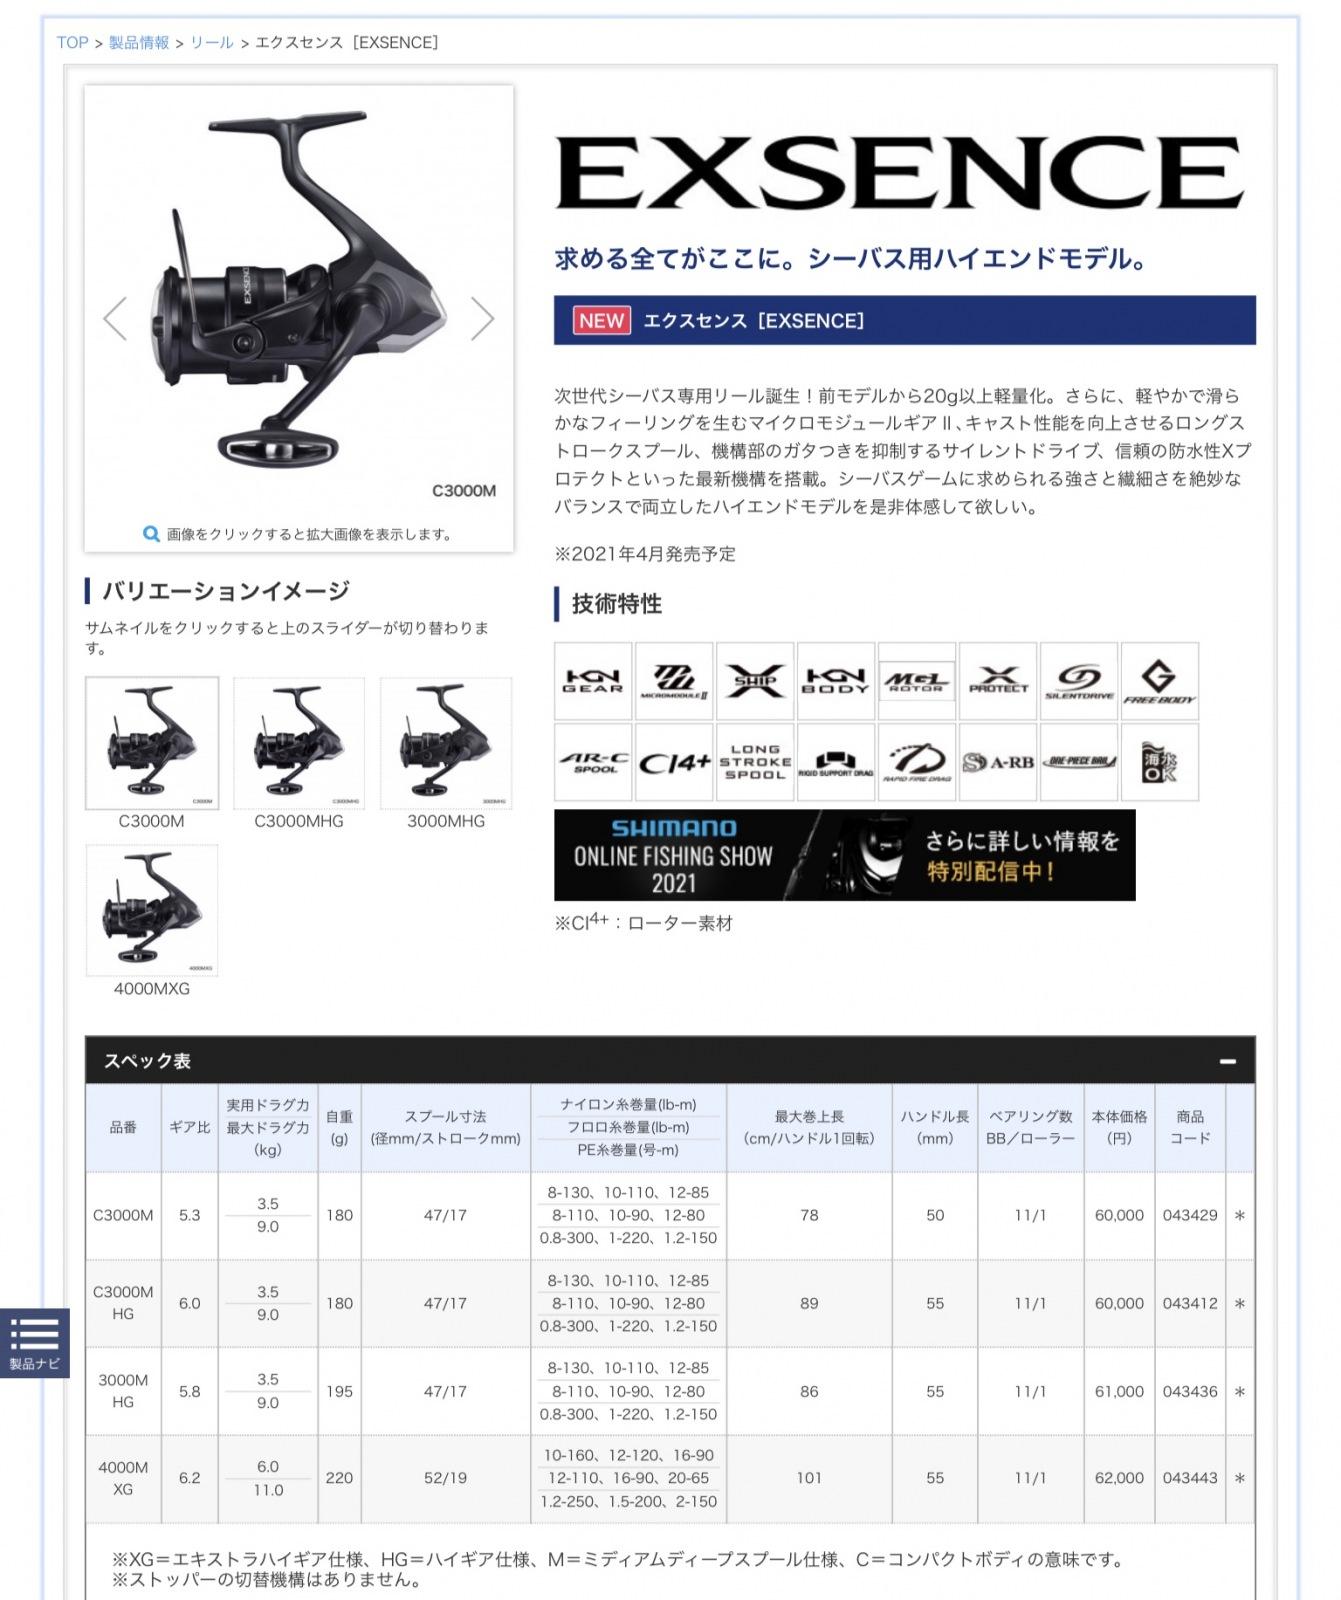 C200065D-8642-46FA-BCD0-1720843FC568.jpeg